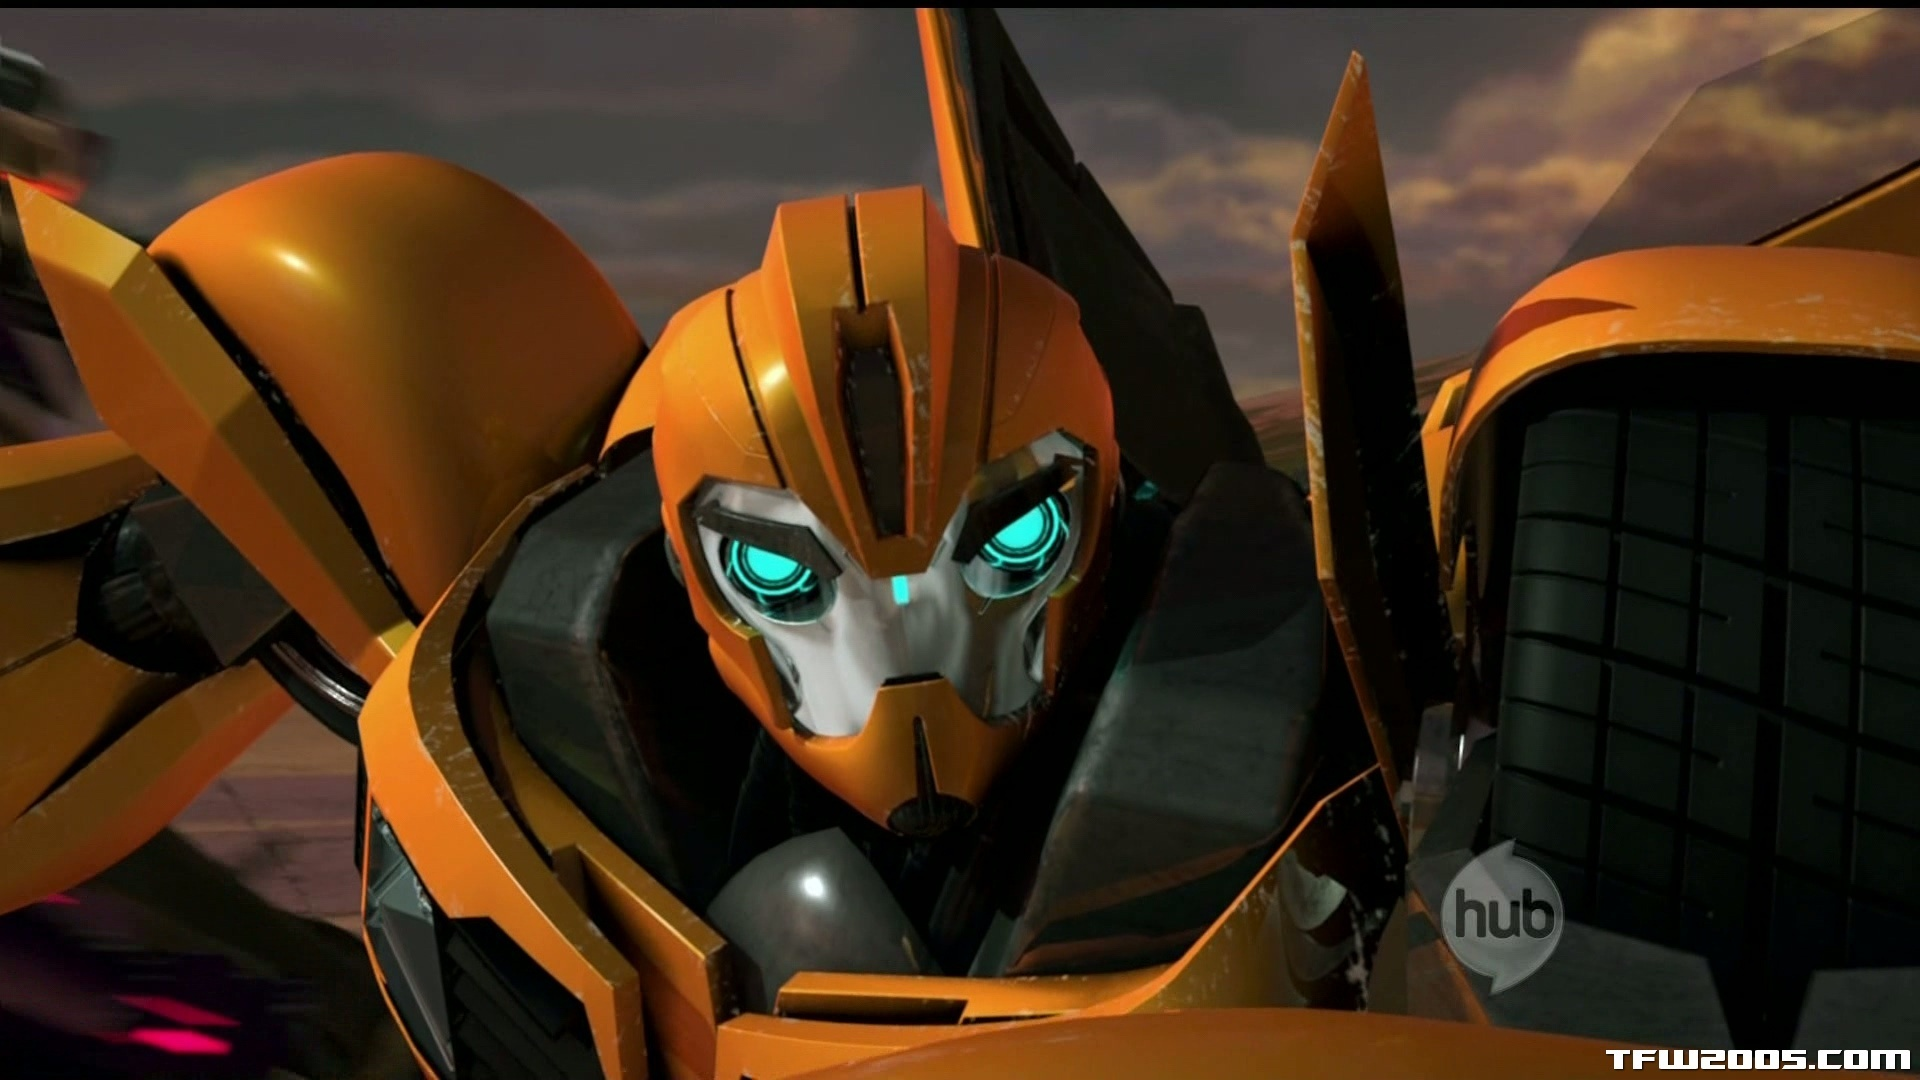 Transformers Prime Bumblebee - Transformers Prime Fan club